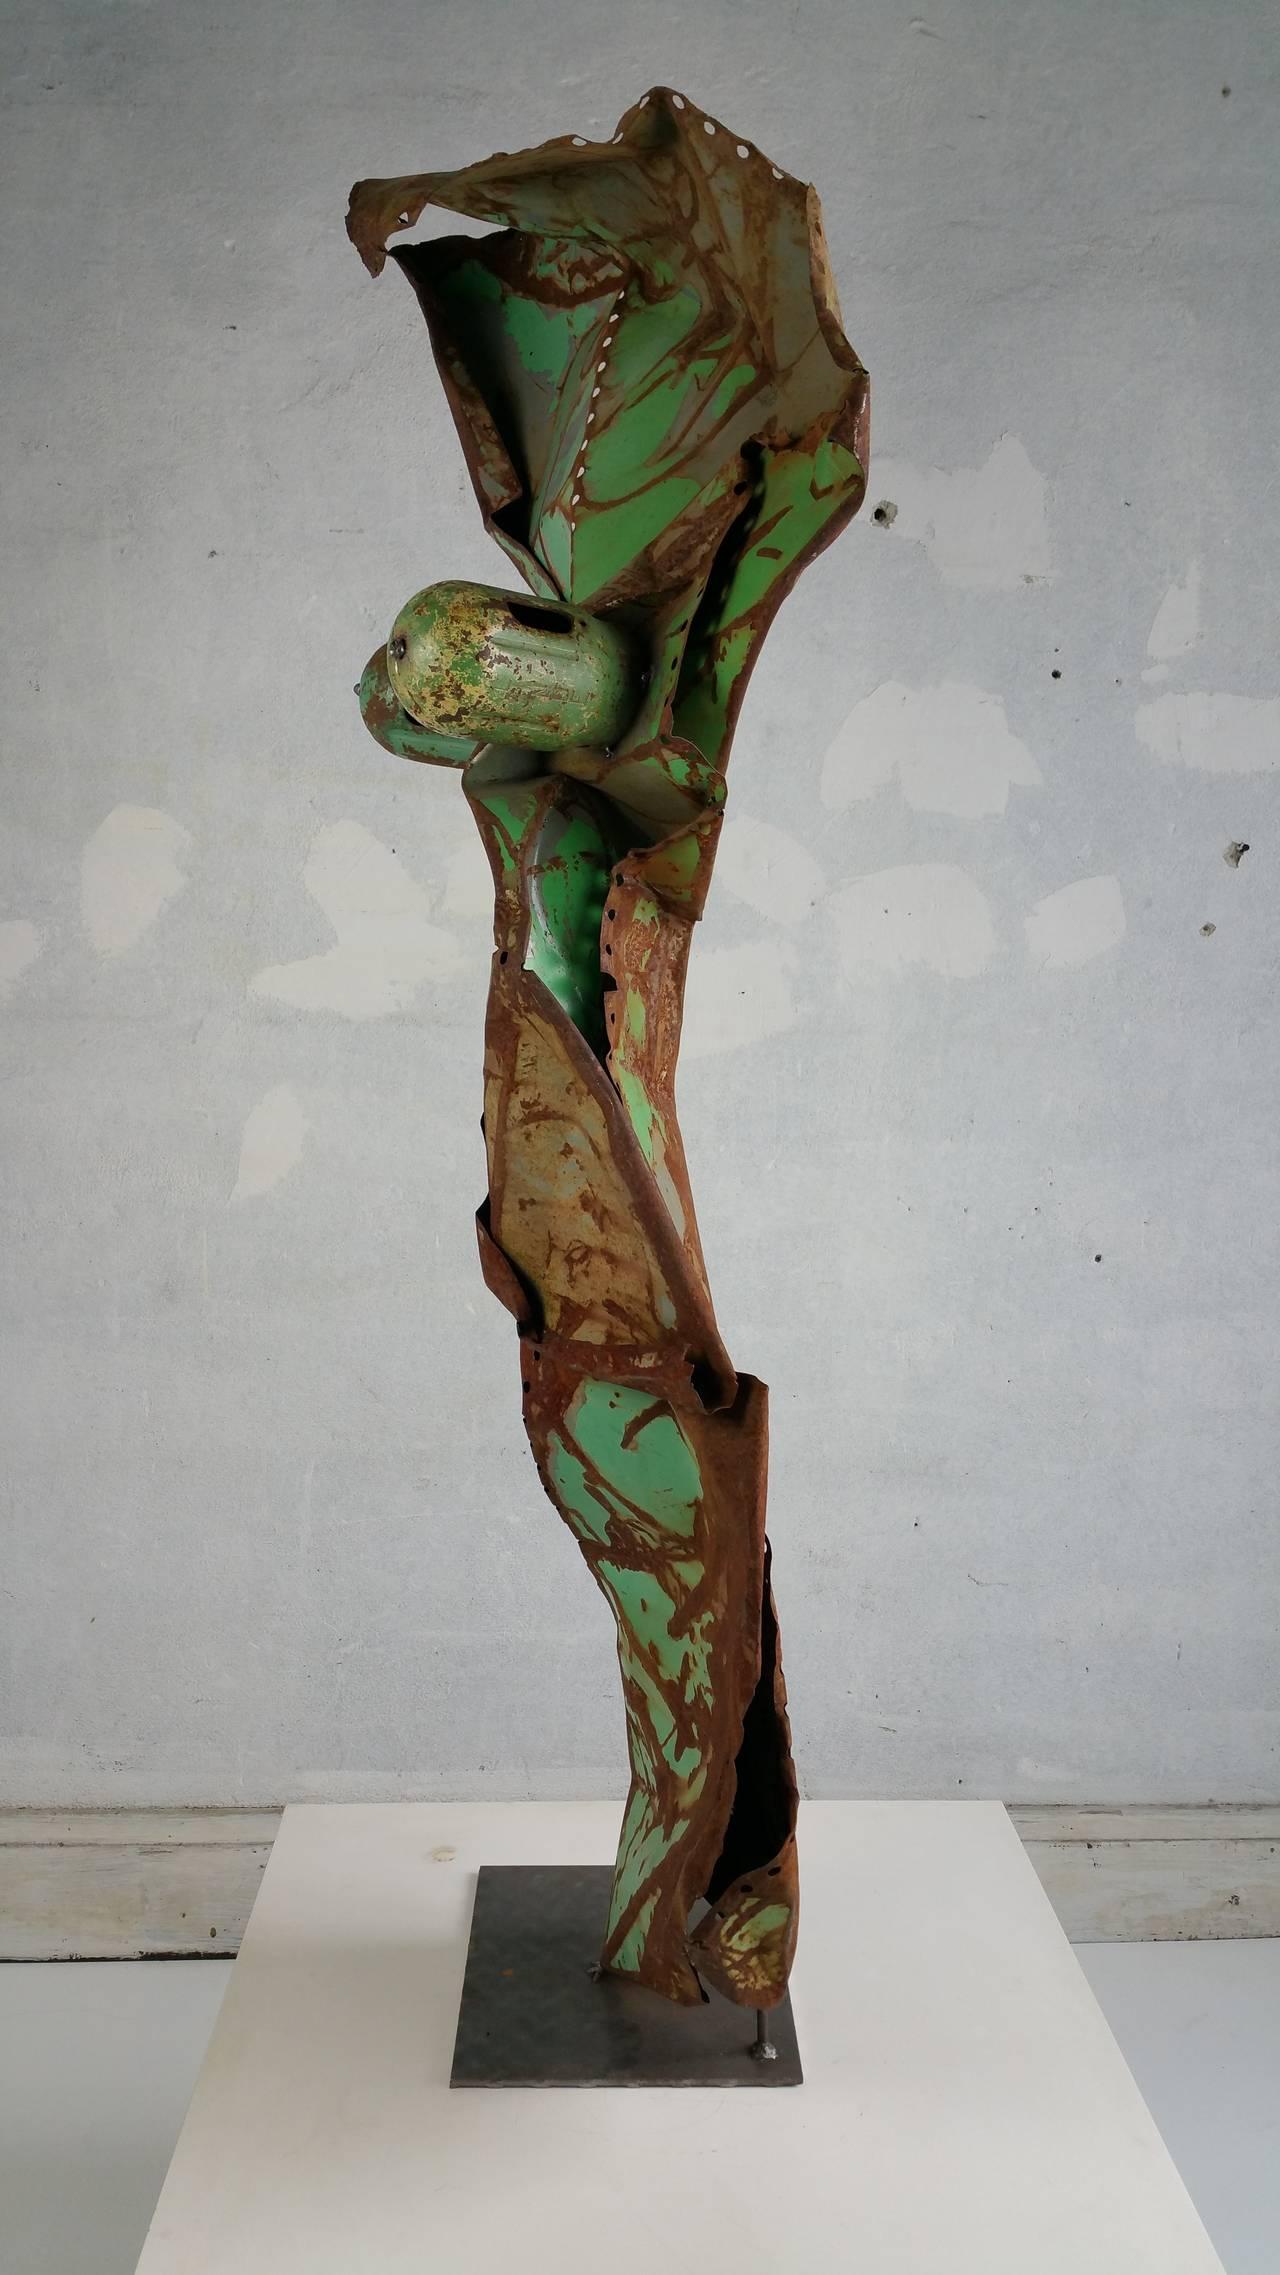 Monumental 5 Foot Metal Abstract Brutalist Sculpture